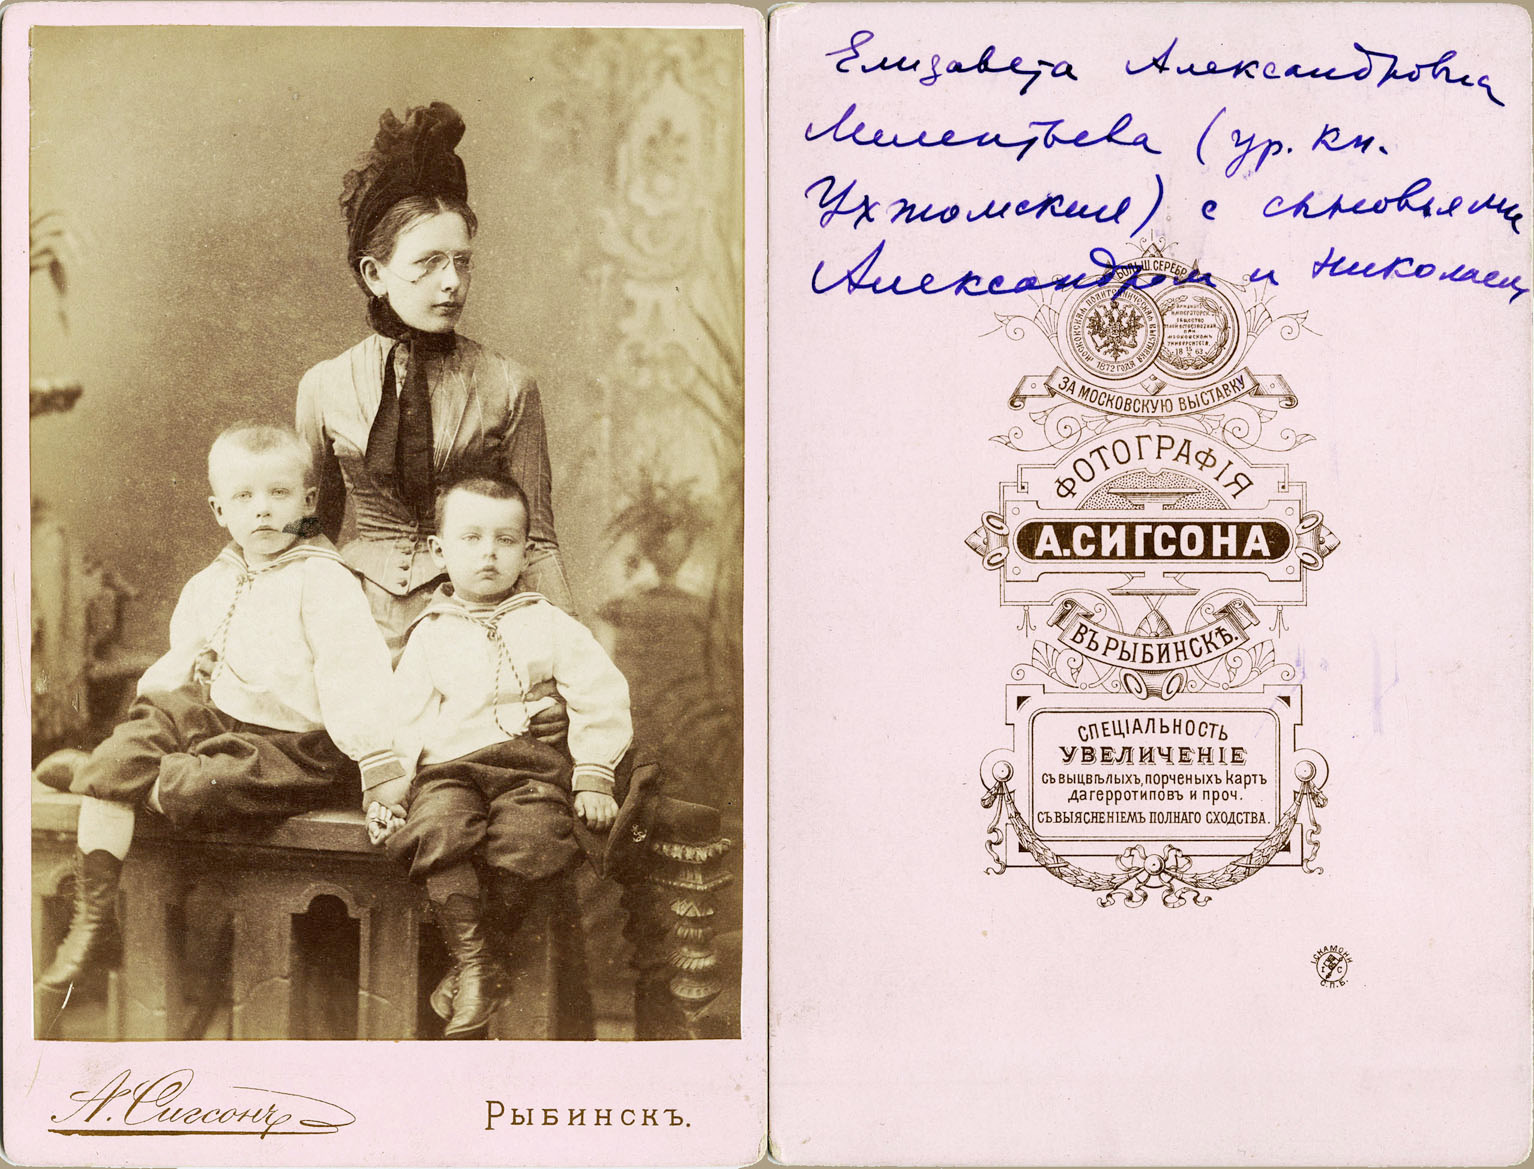 MELENTIEVA, Е. А. (Мелентьева Е.А.)